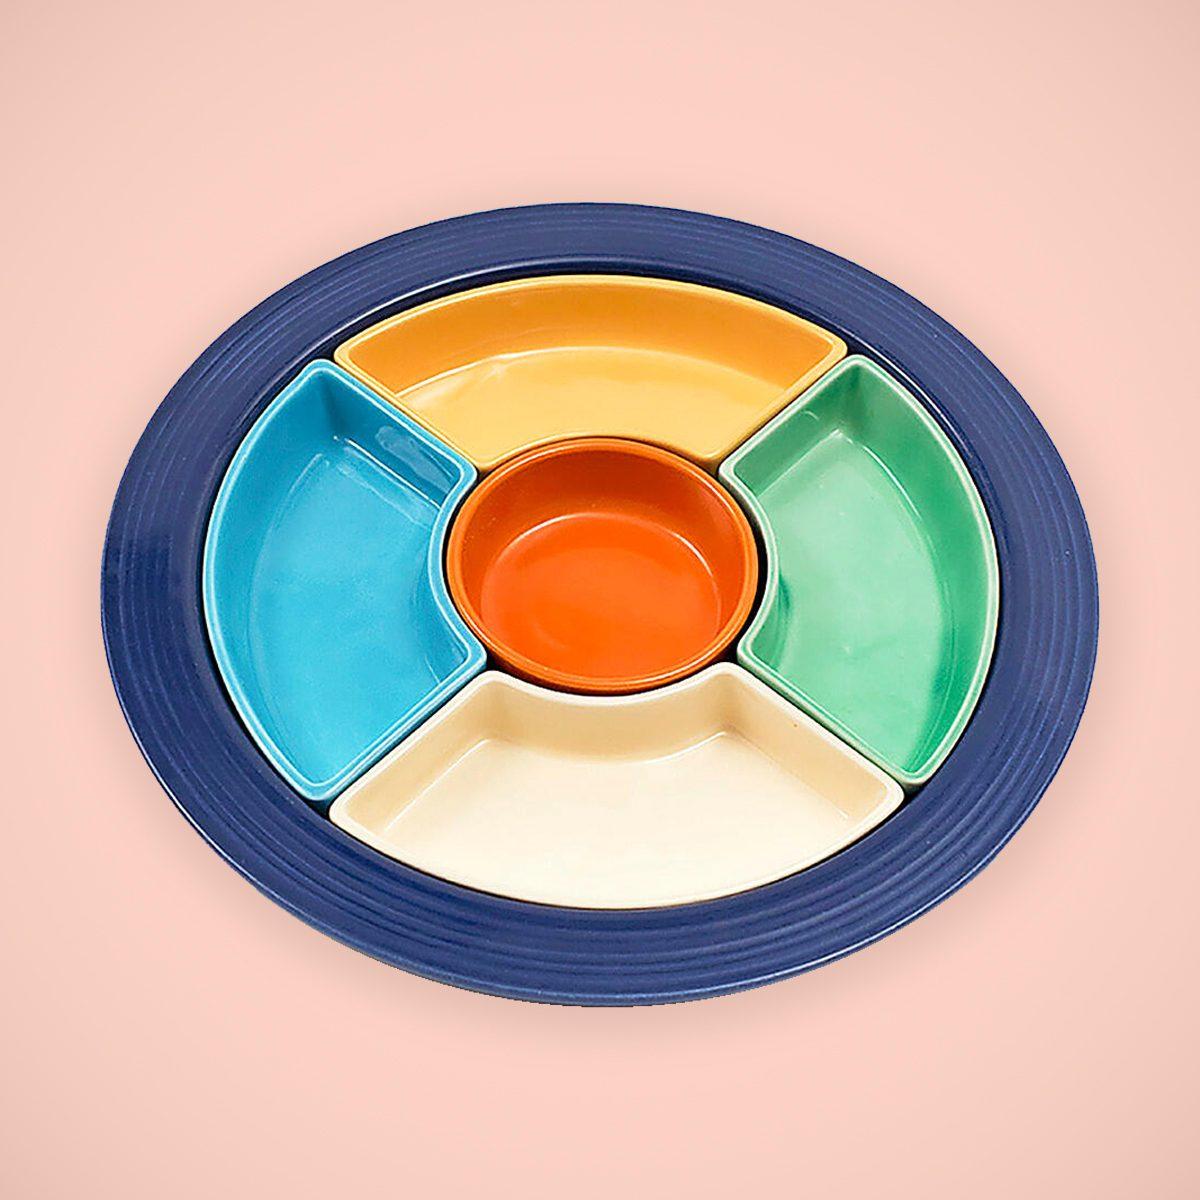 fiesta Iconic design relish tray